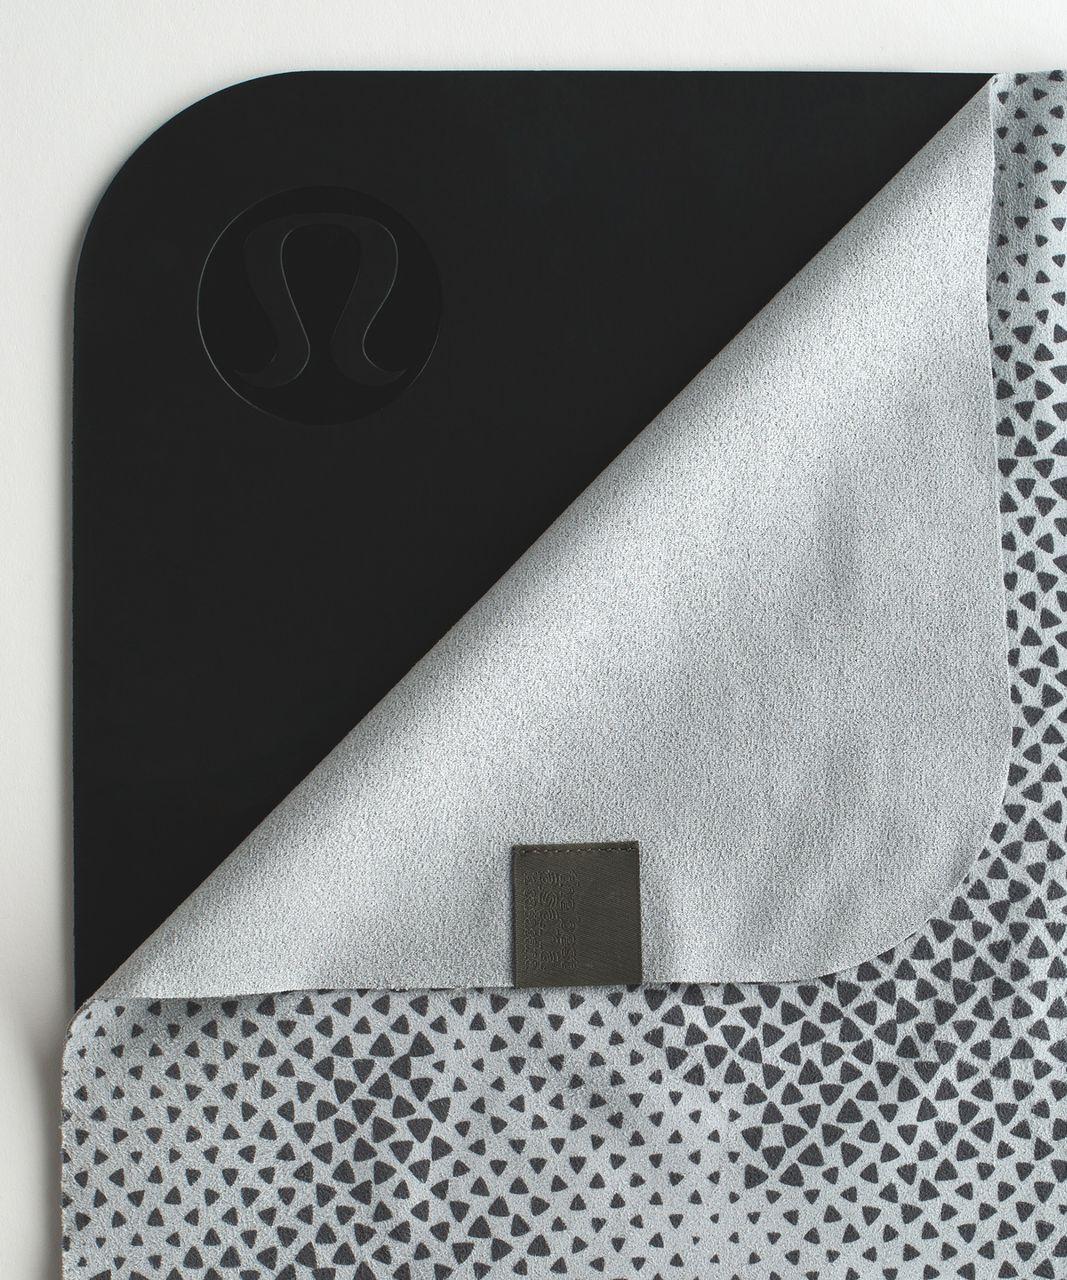 Lululemon The (Big) Towel - Hyper Diamond Camo Silver Spoon Slate